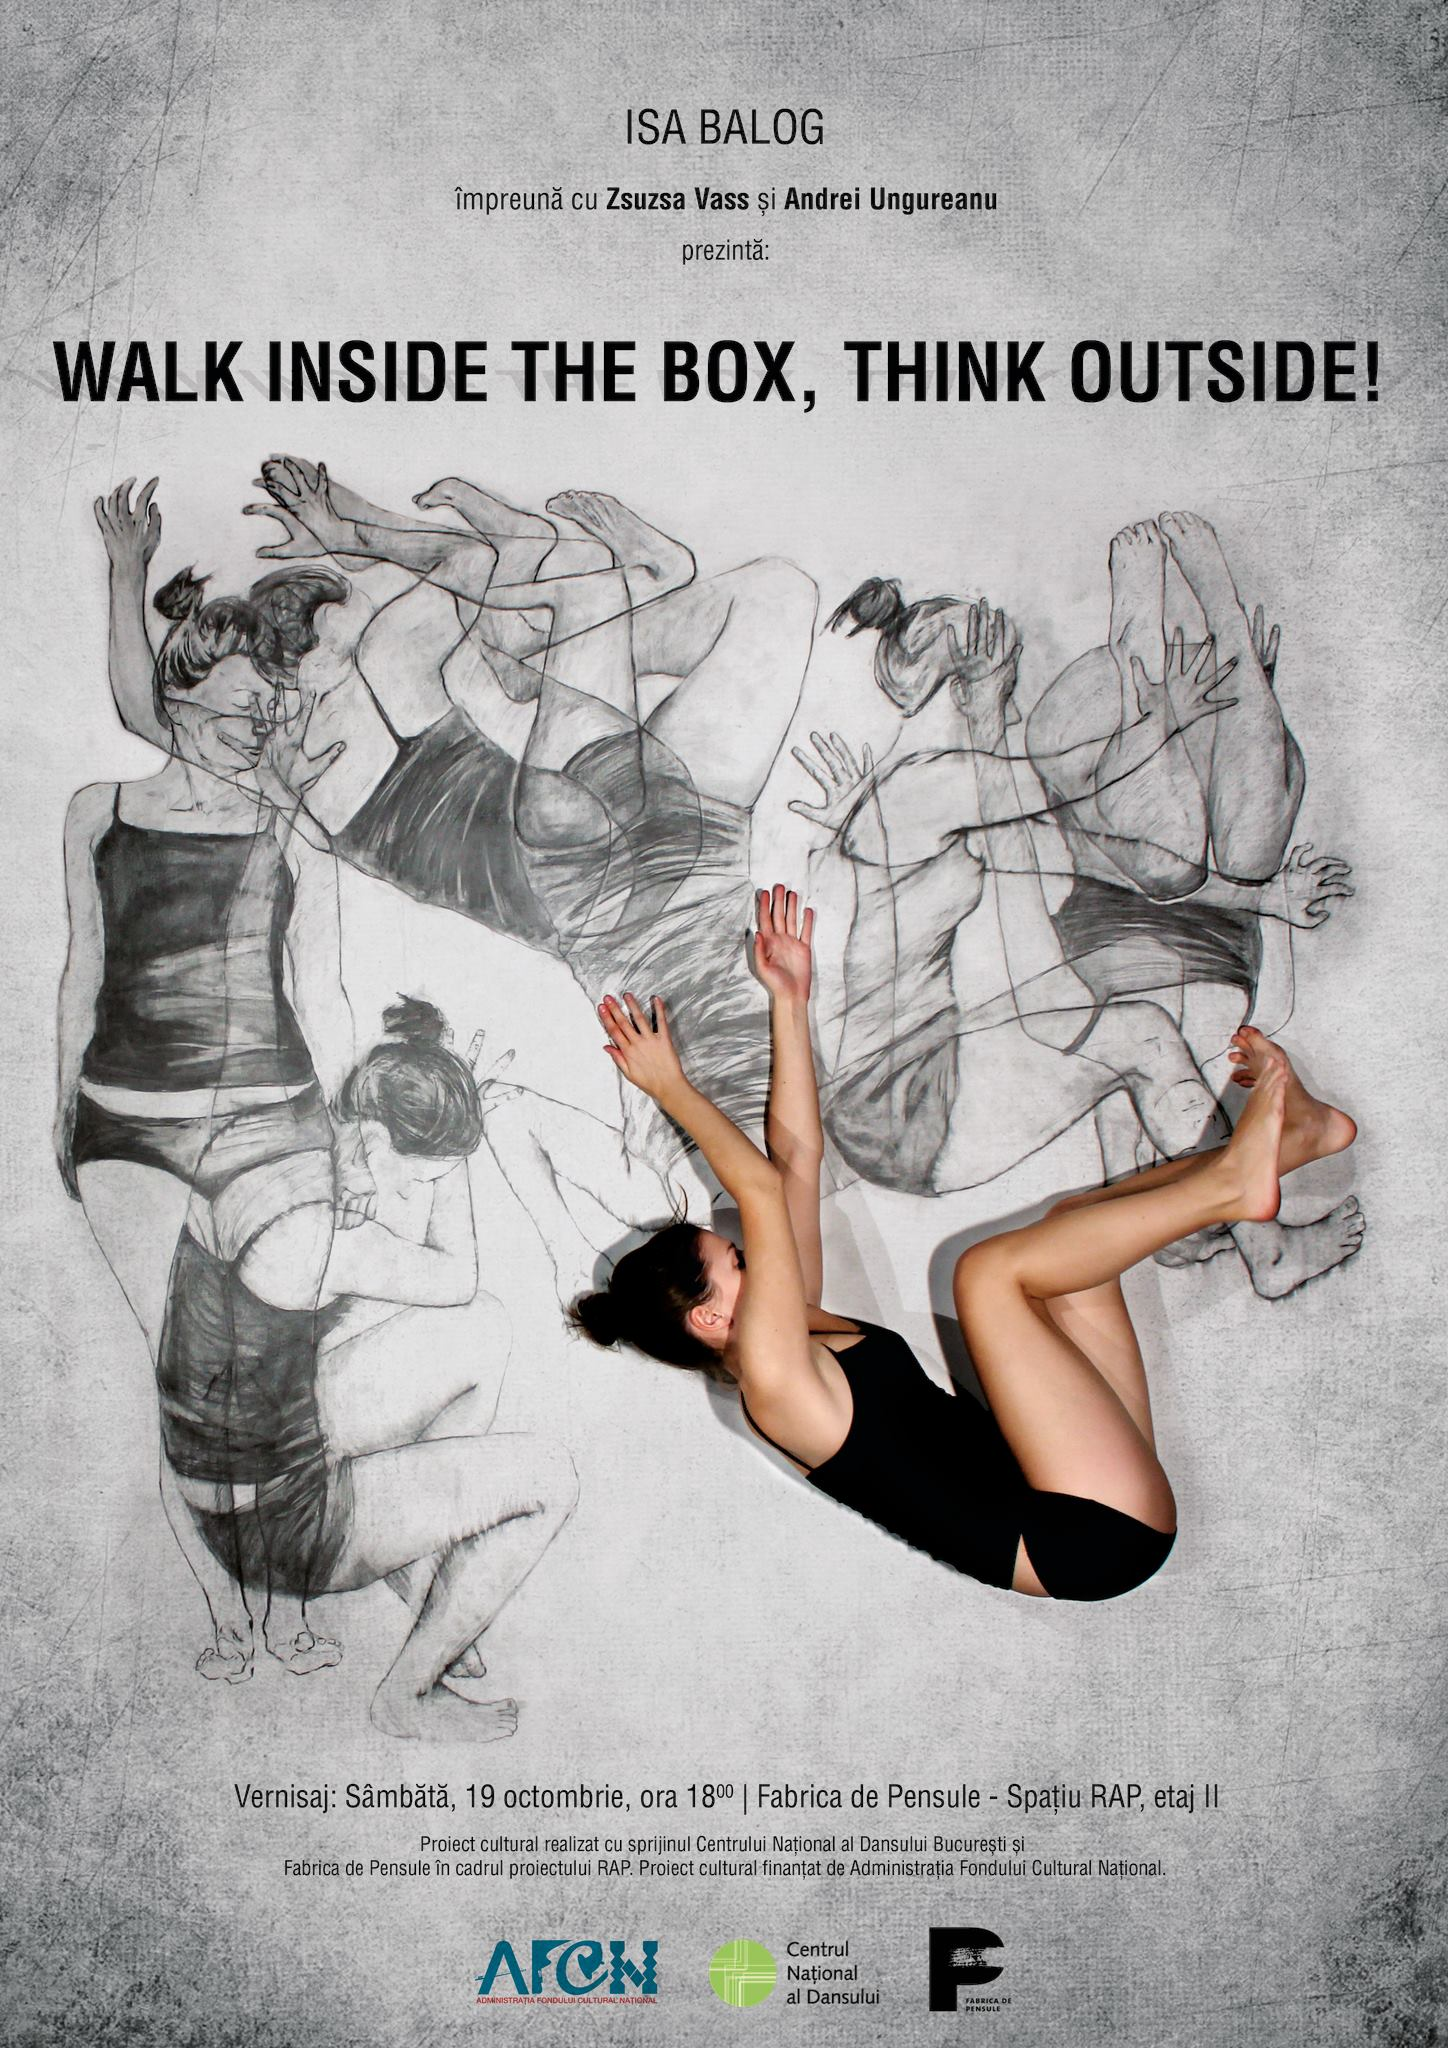 Walk inside the box / think outside!